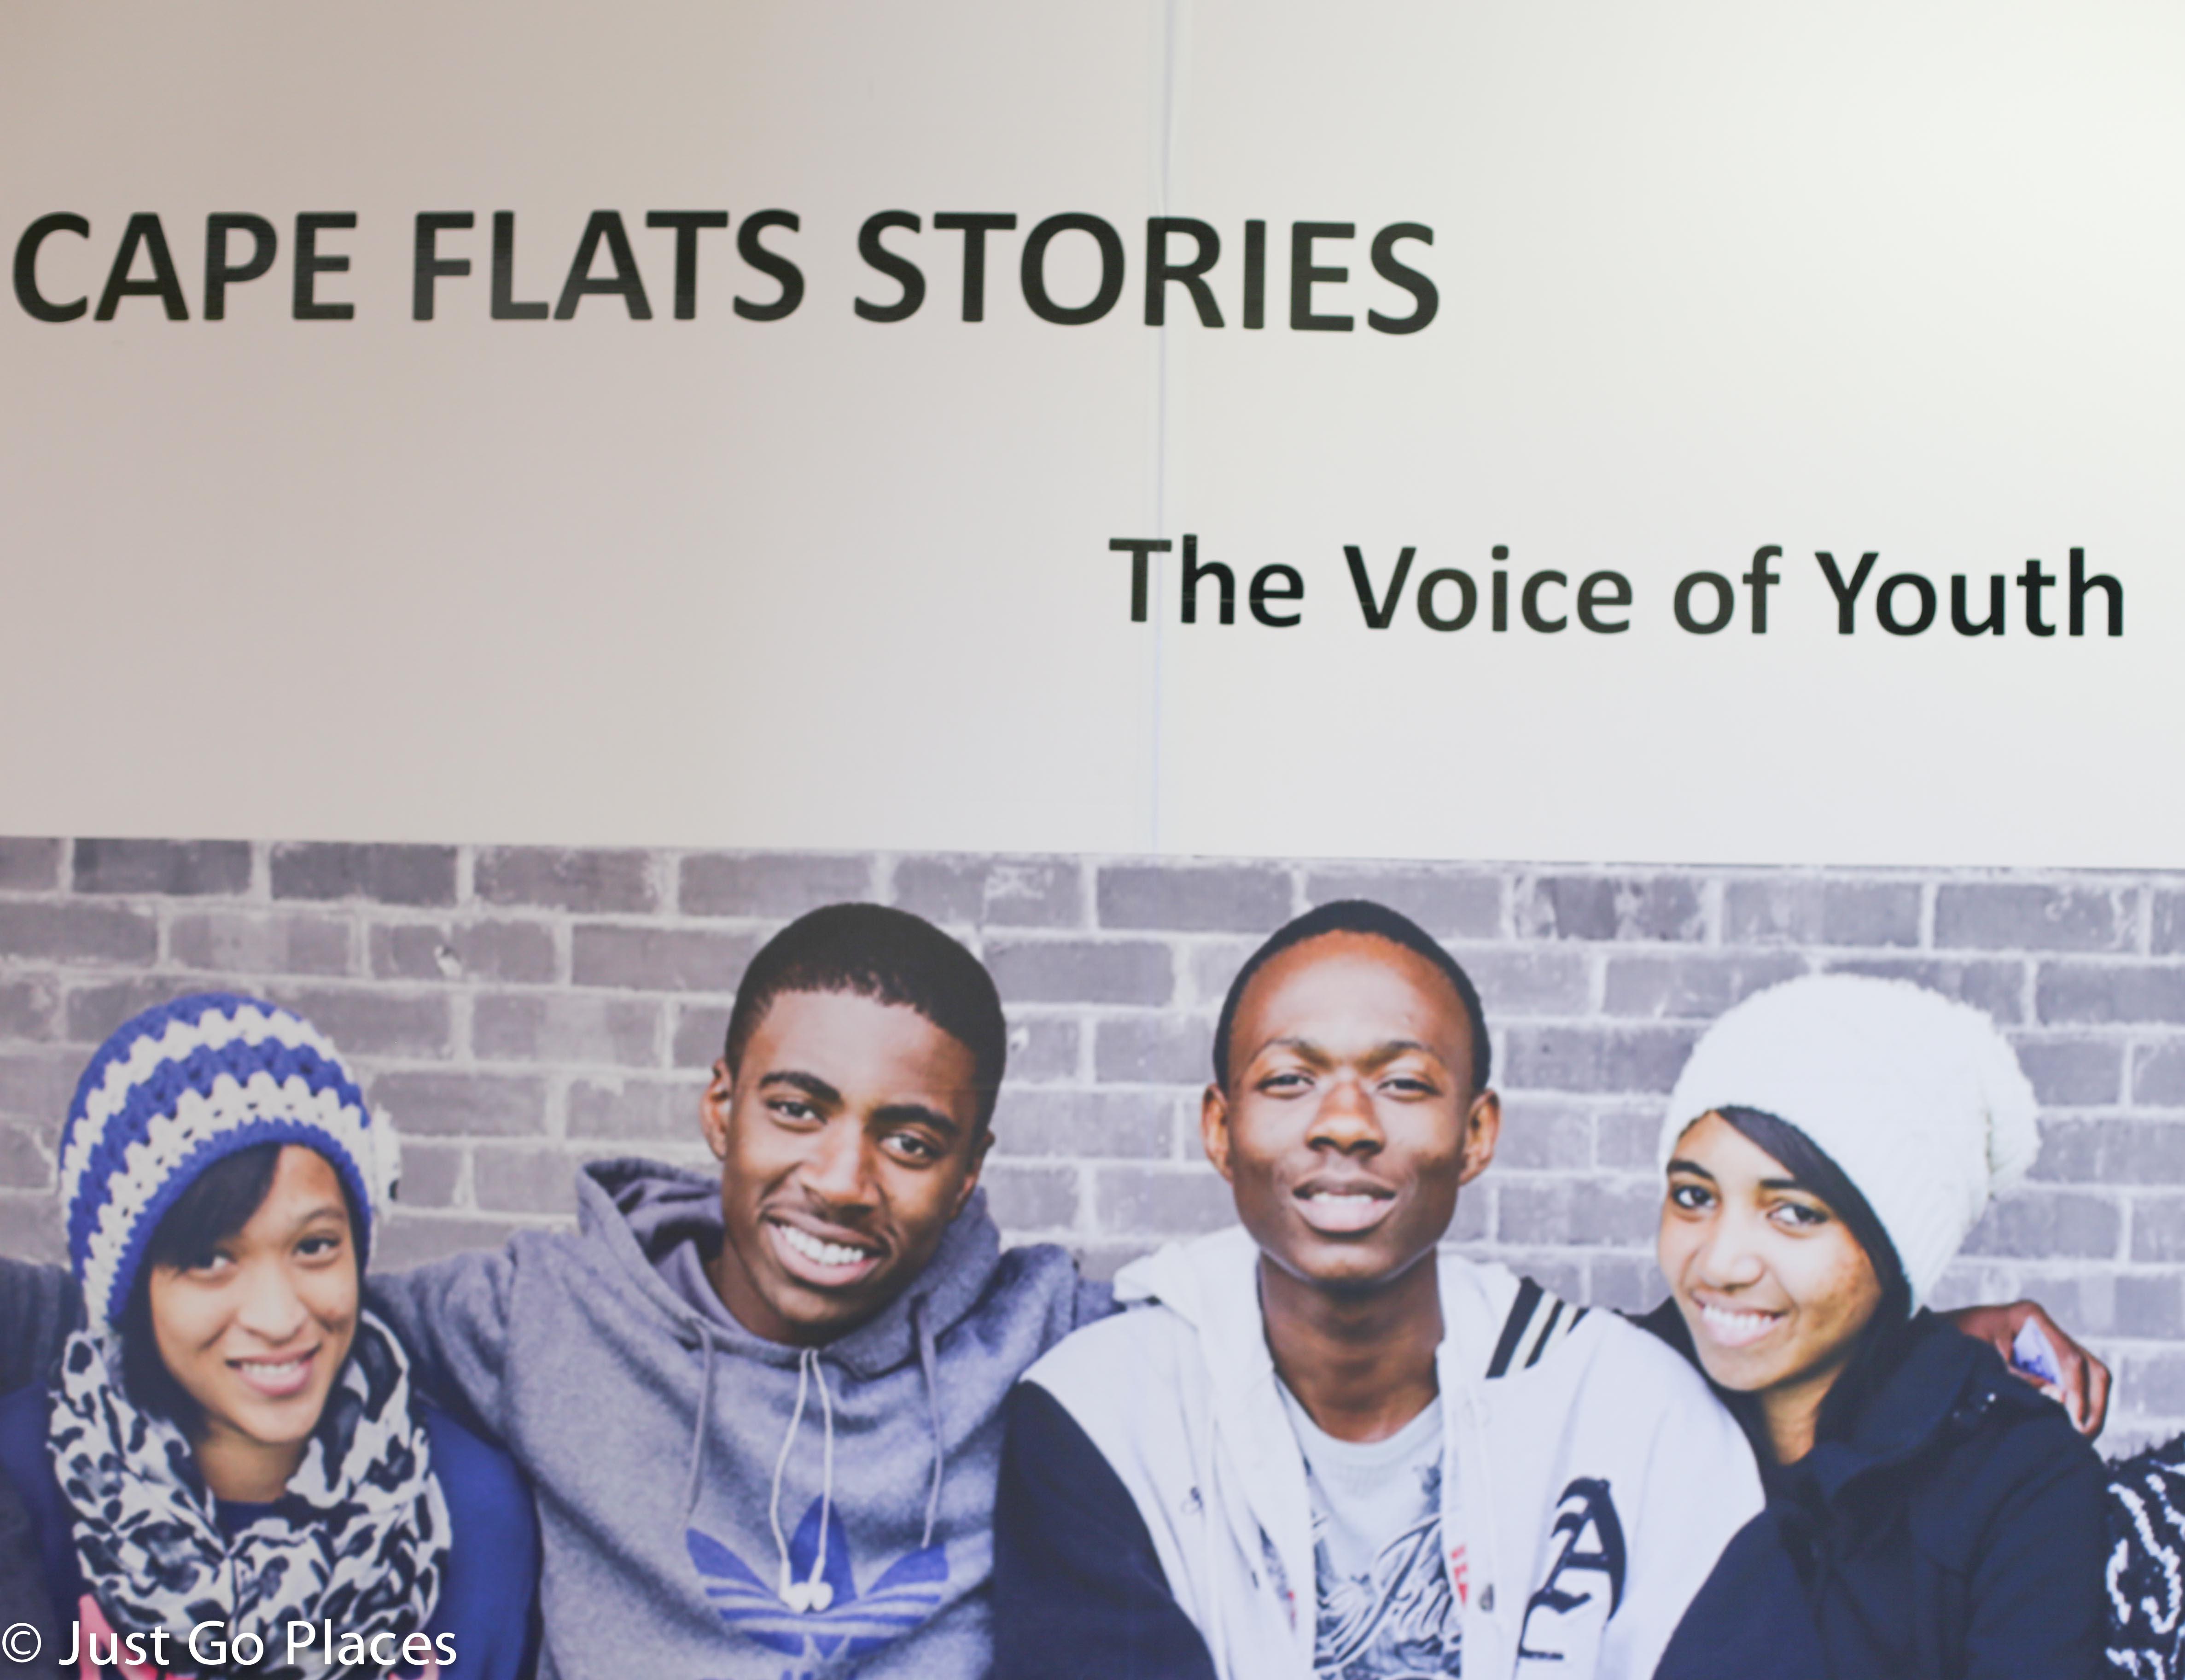 Cape Flats Stories